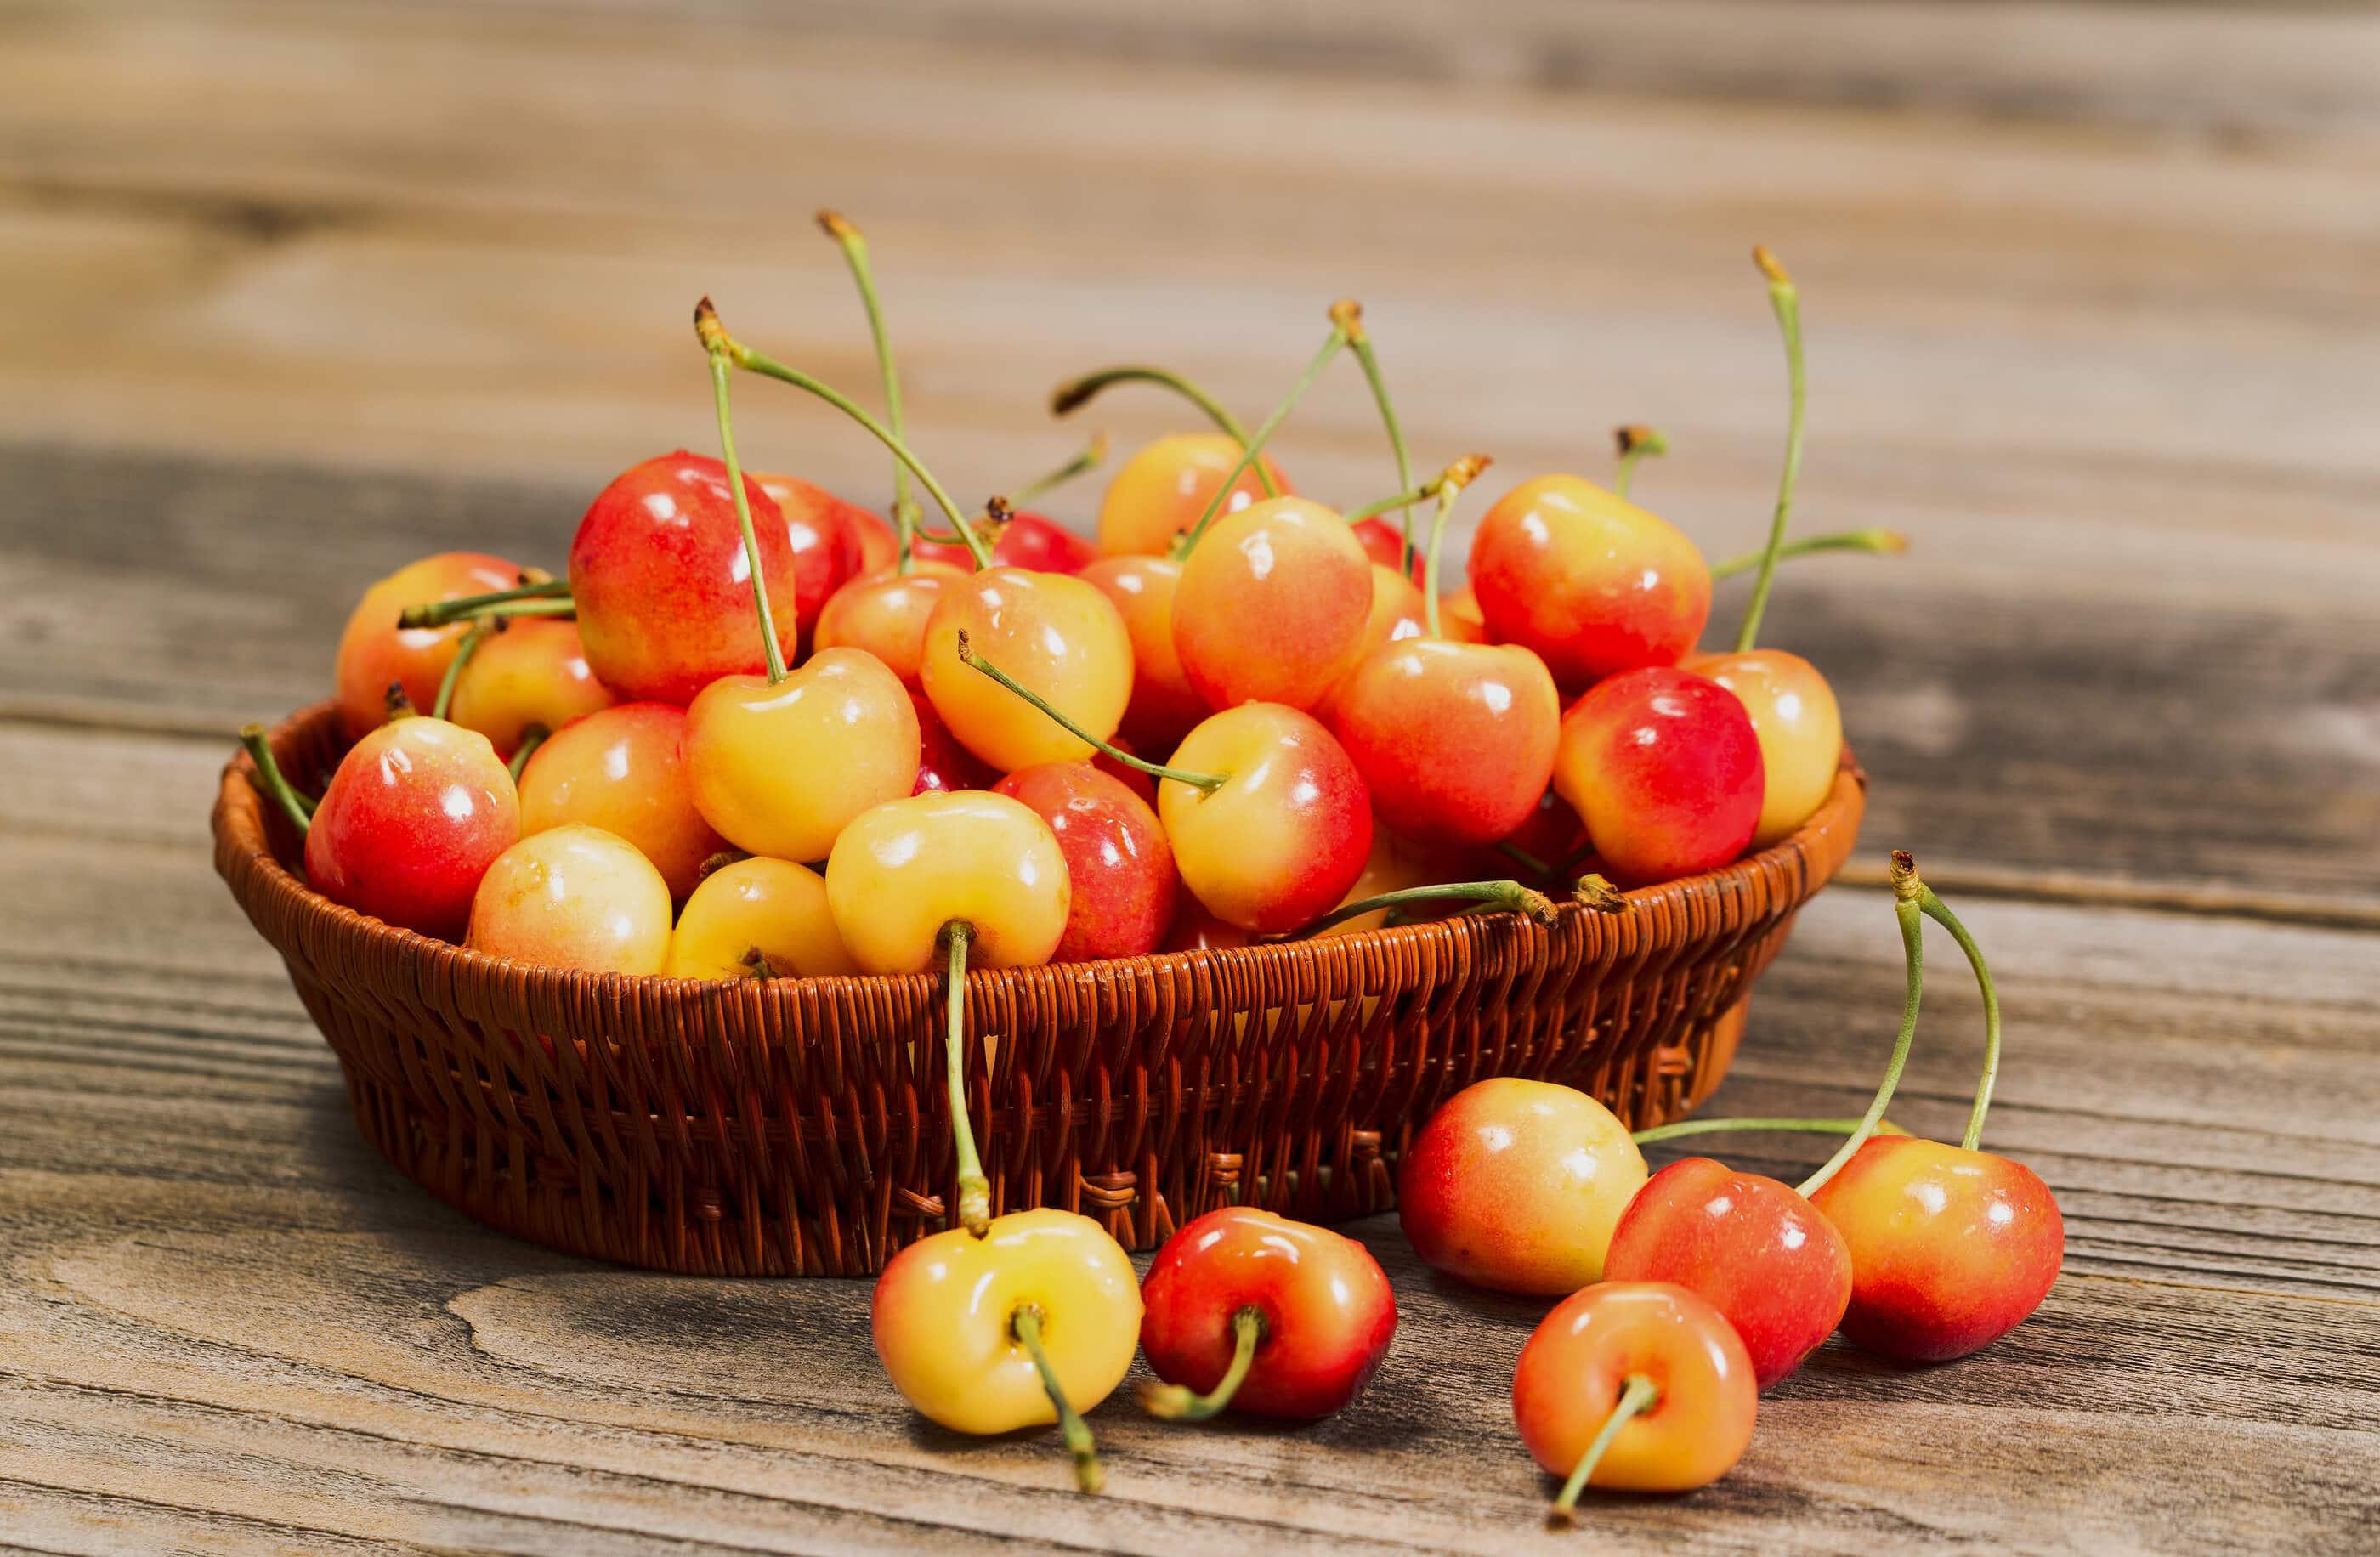 Golden-Rainier-Cherries nhập khẩu từ Mỹ